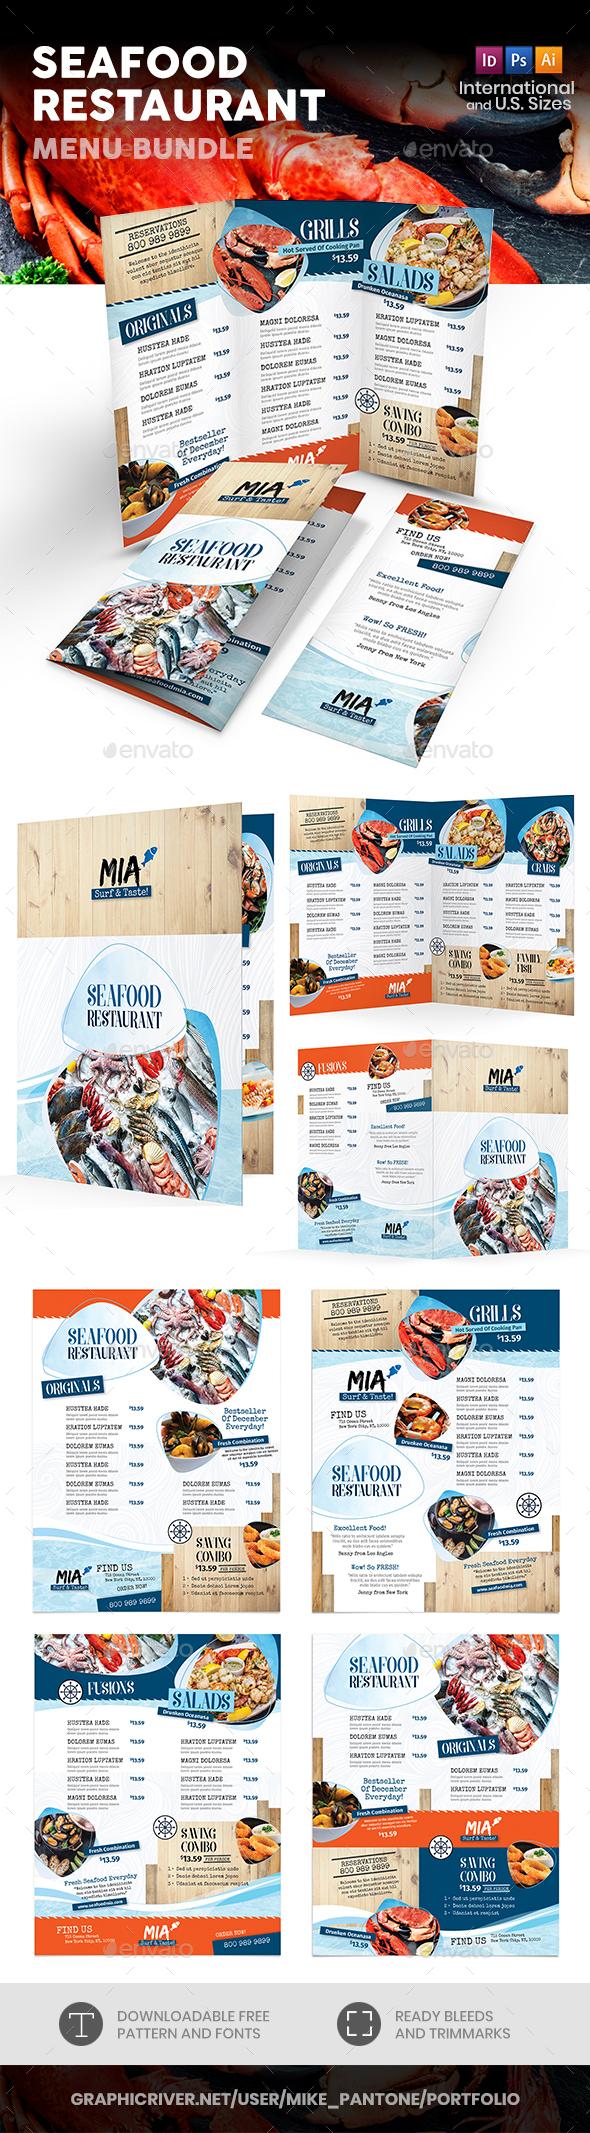 Seafood Restaurant Menu Print Bundle 3 - Food Menus Print Templates